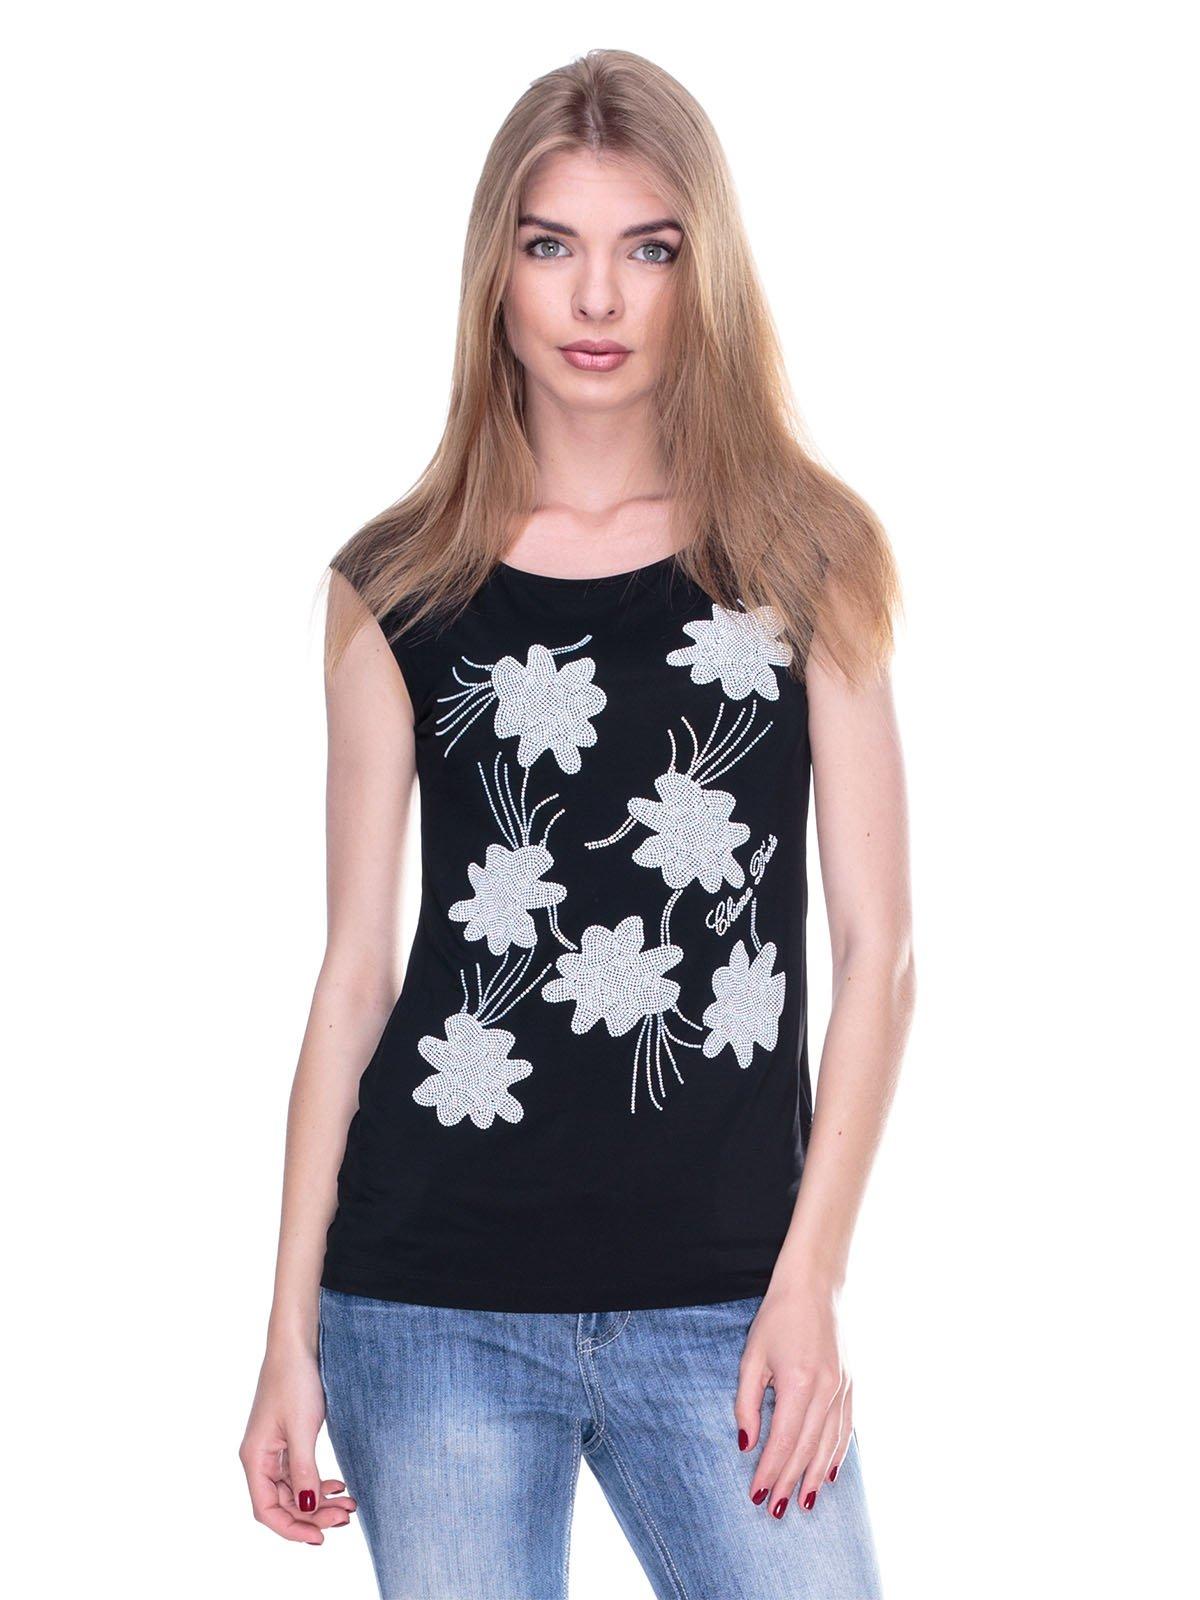 Блуза чорна з малюнком зі страз | 2317107